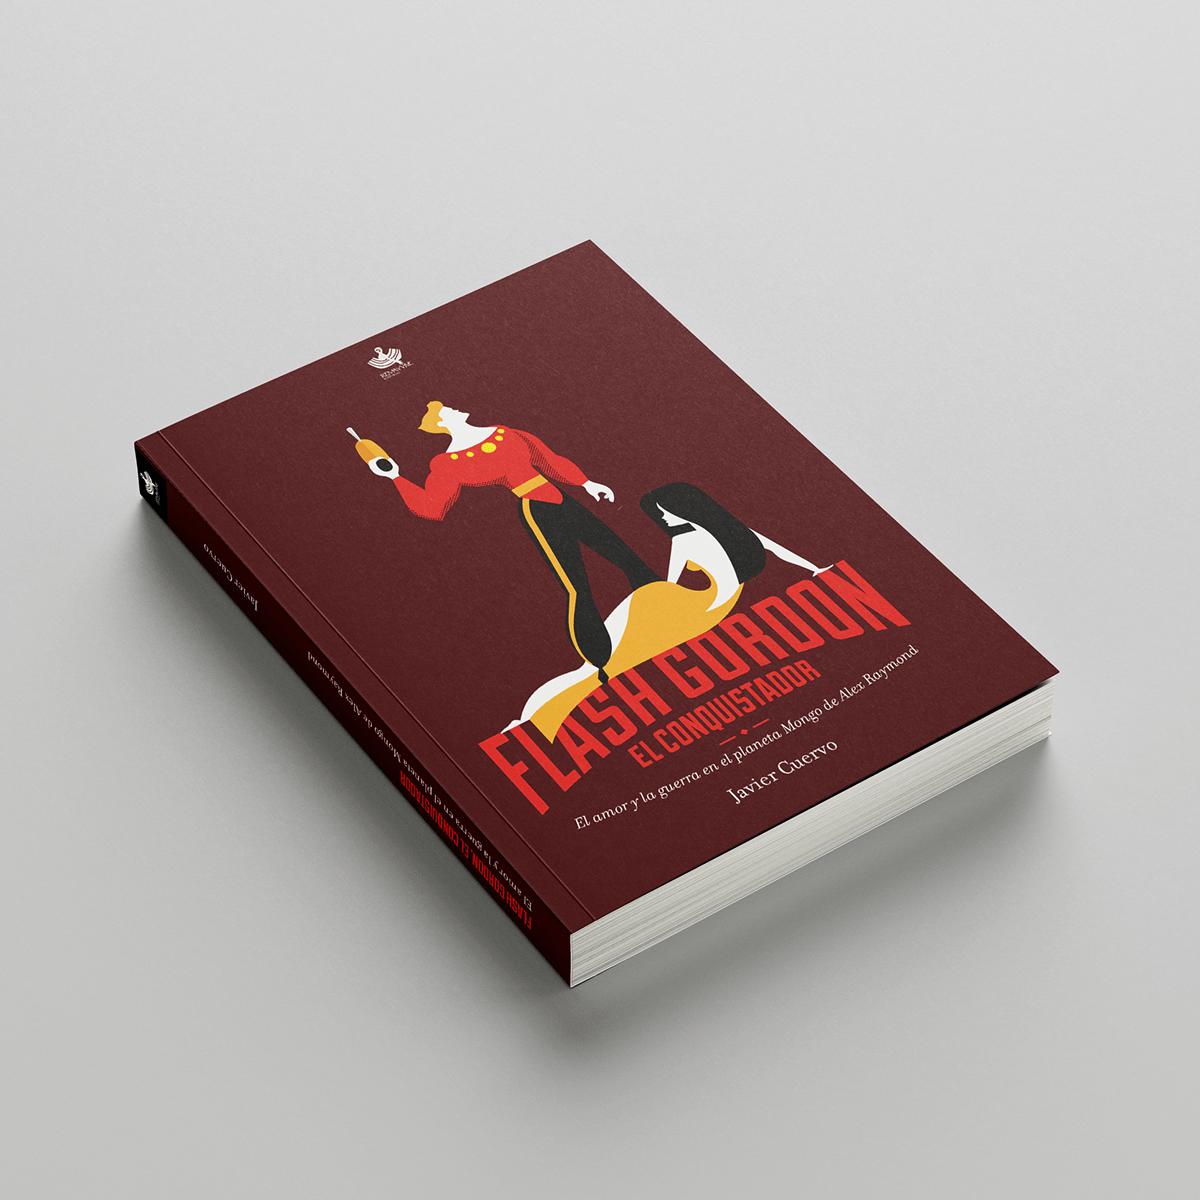 Image may contain: book, bird and cartoon